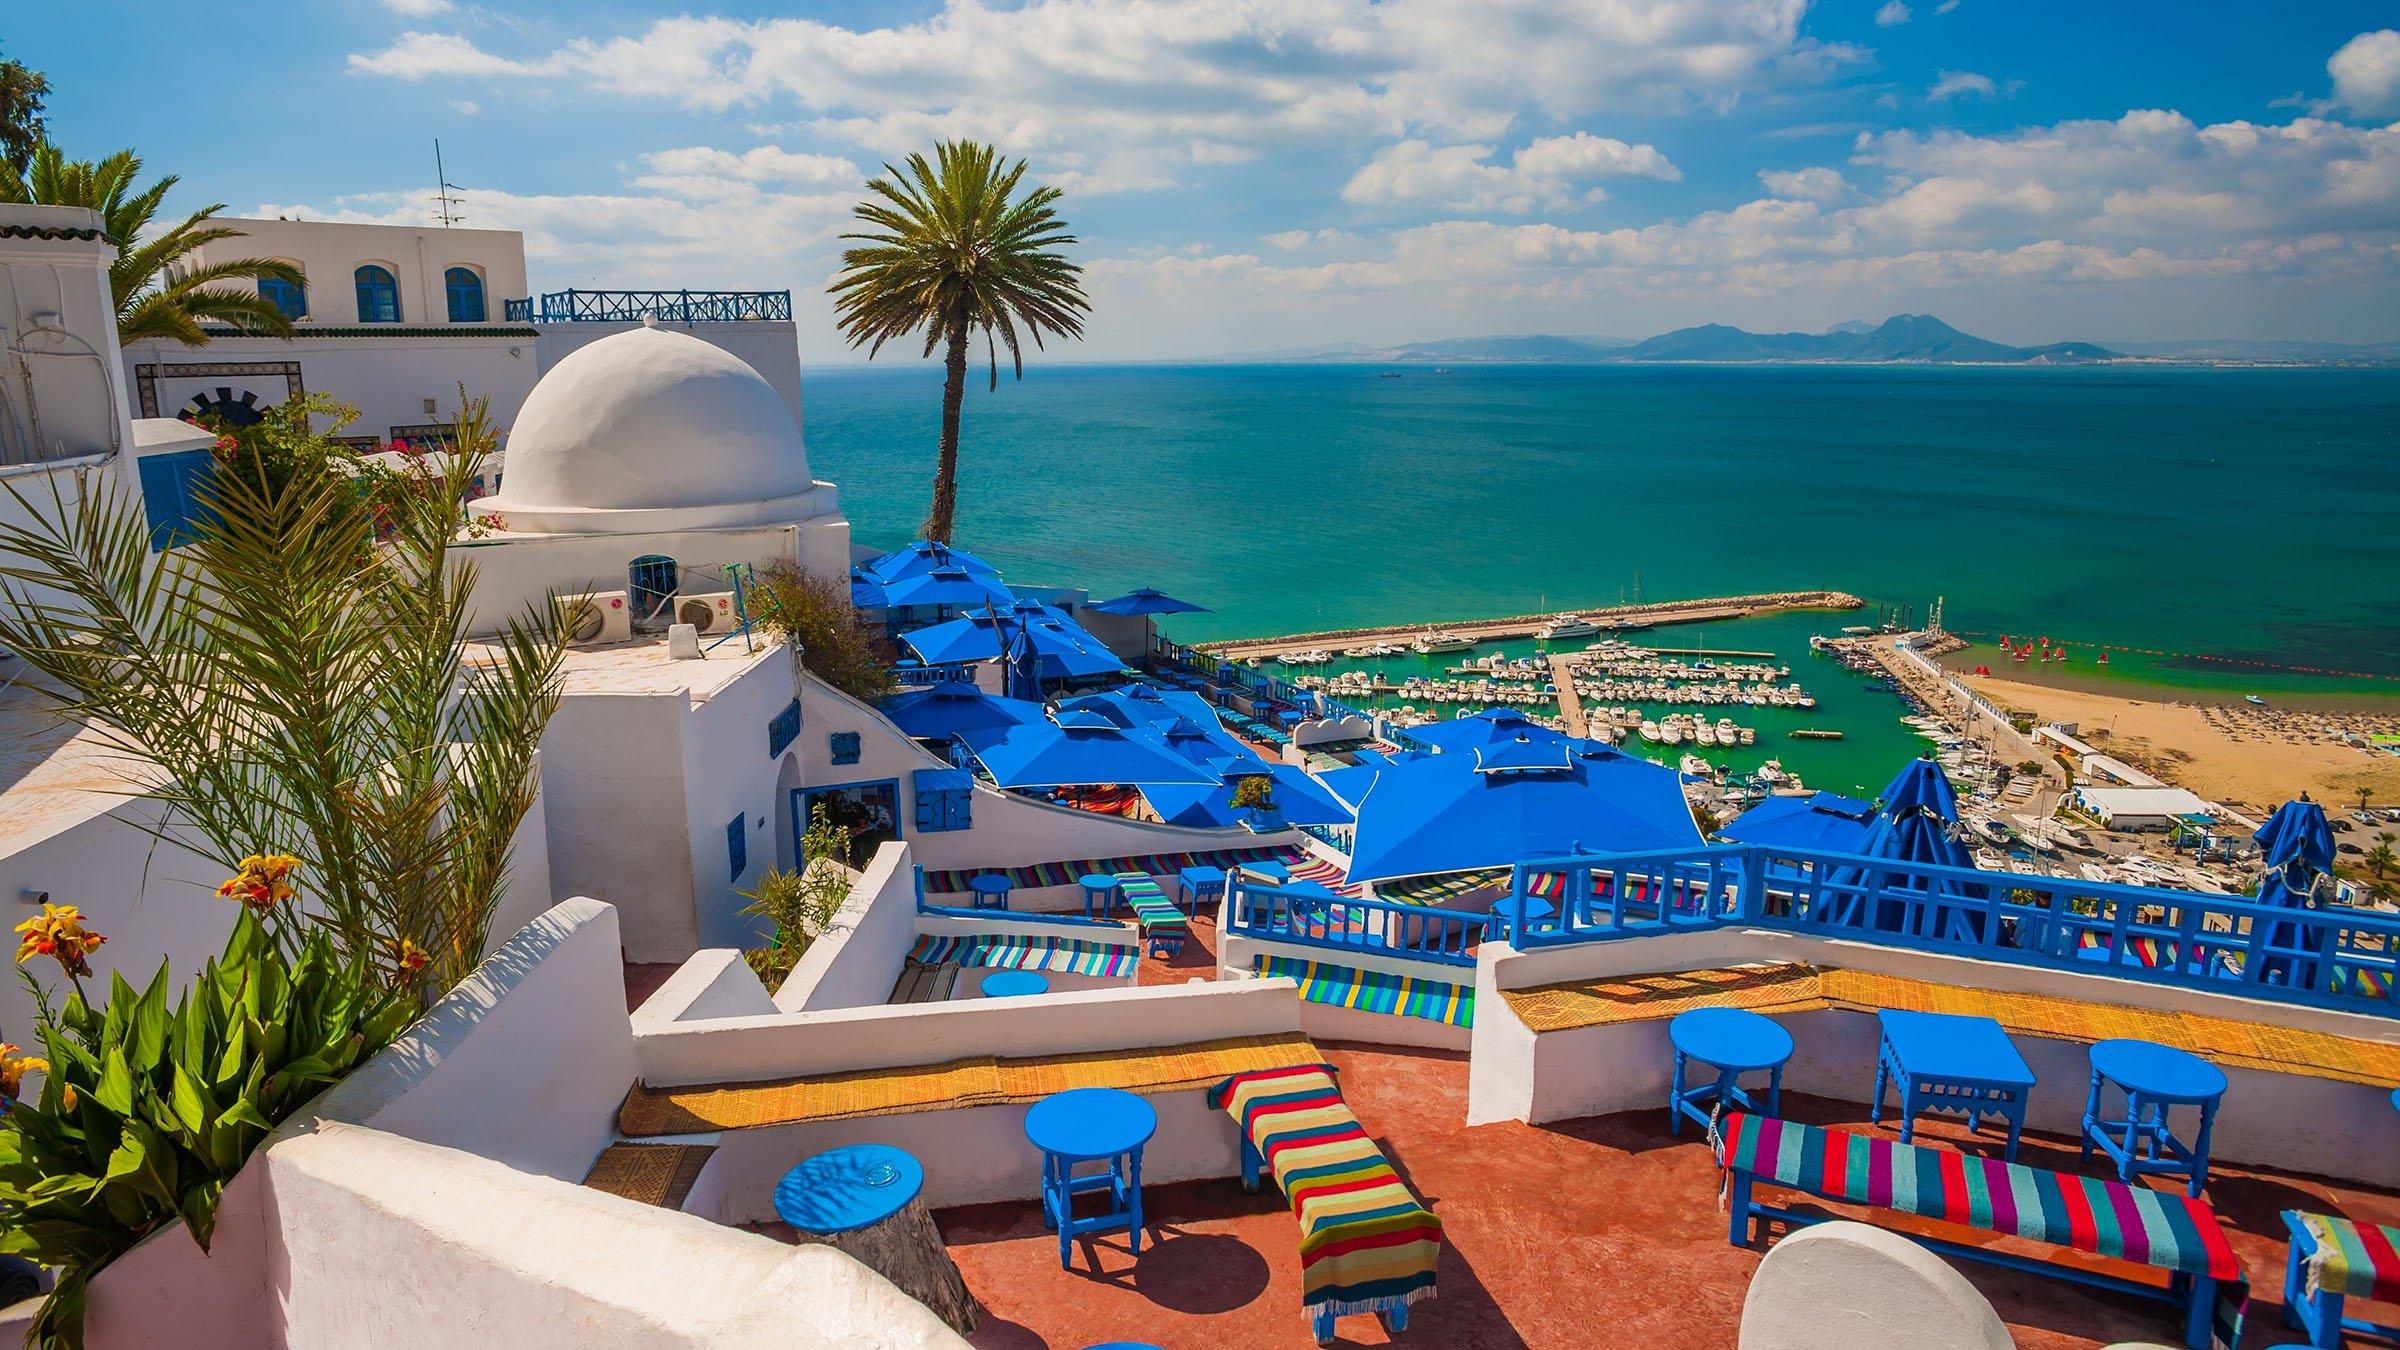 Sidi bou said un destino tur stico de la costa de t nez for Destinos turisticos espana